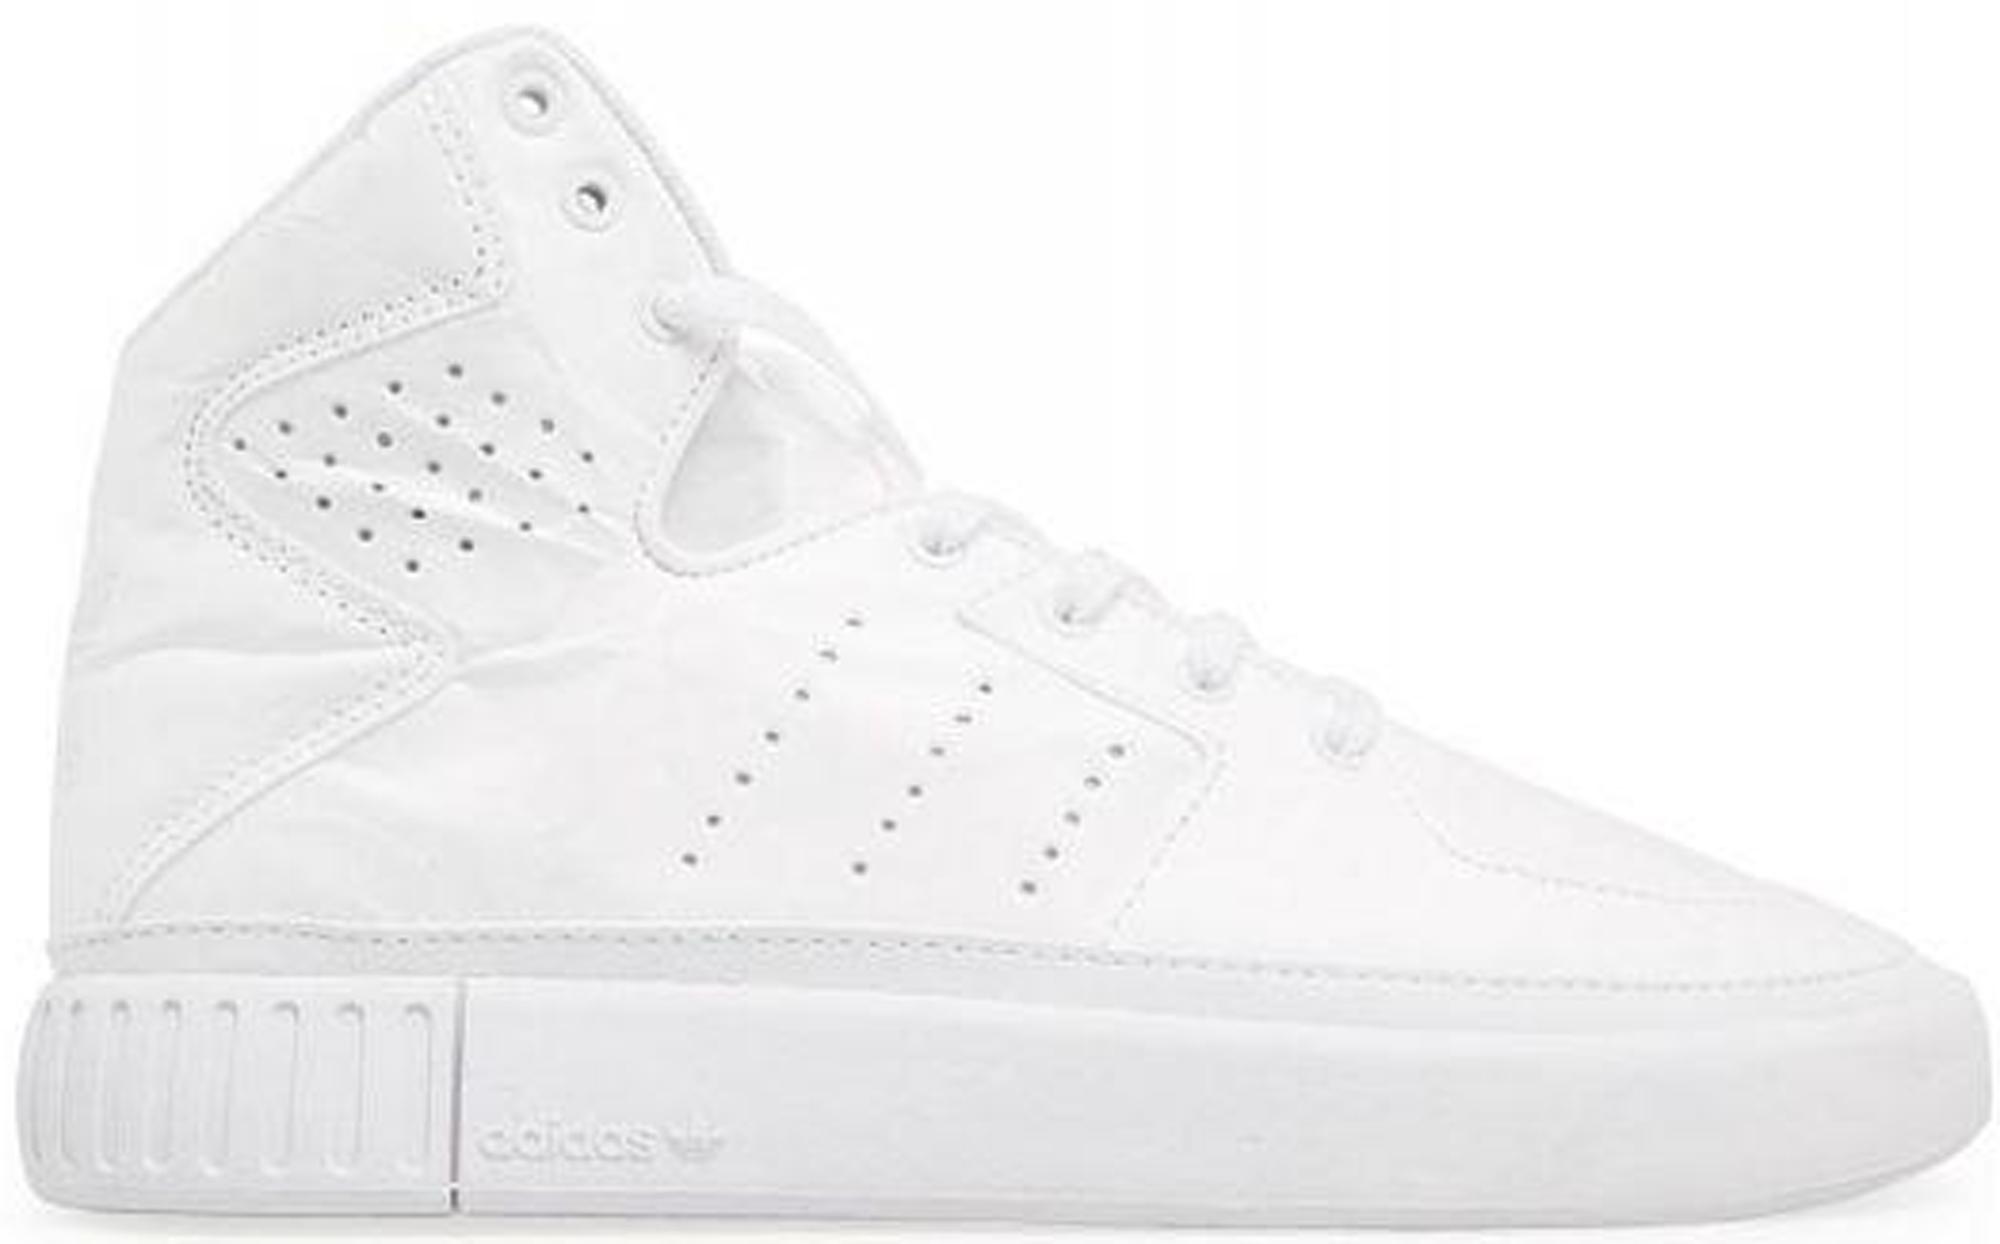 Adidas Originals Adidas Tubular Invader 2.0 Decon Triple White (w) In Footwear White/footwear White/footwear White